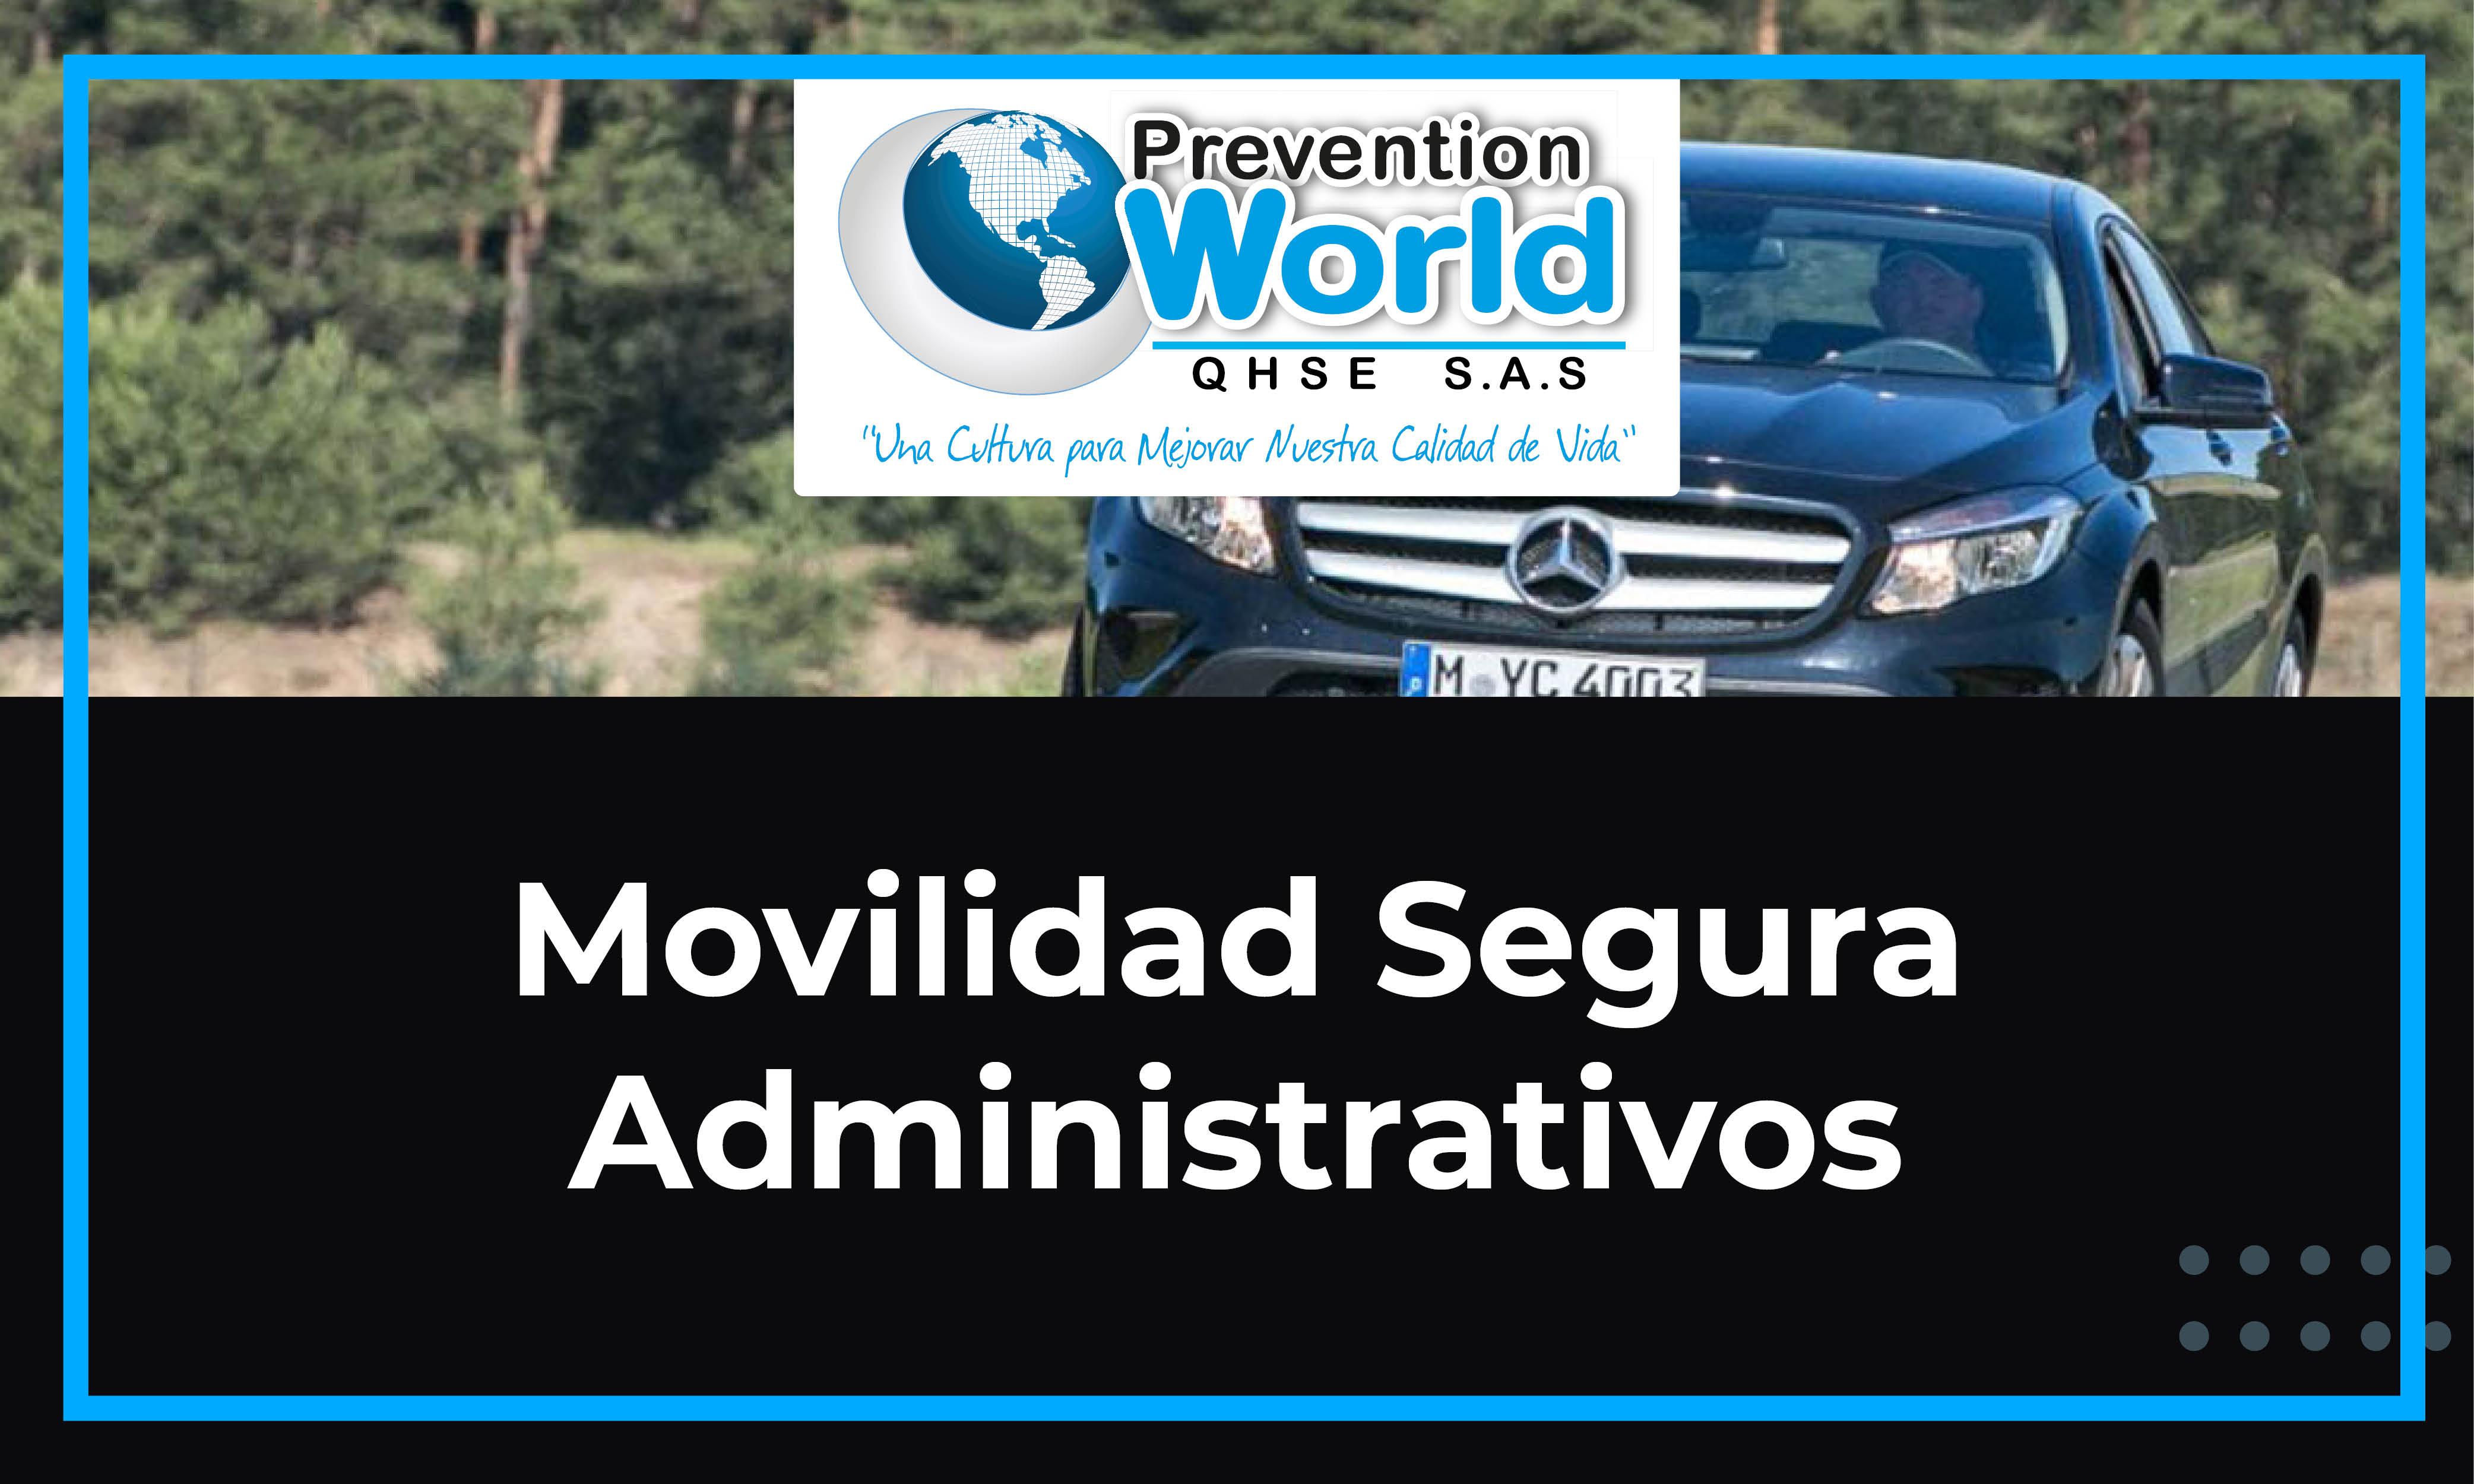 Movilidad Segura - Administrativos